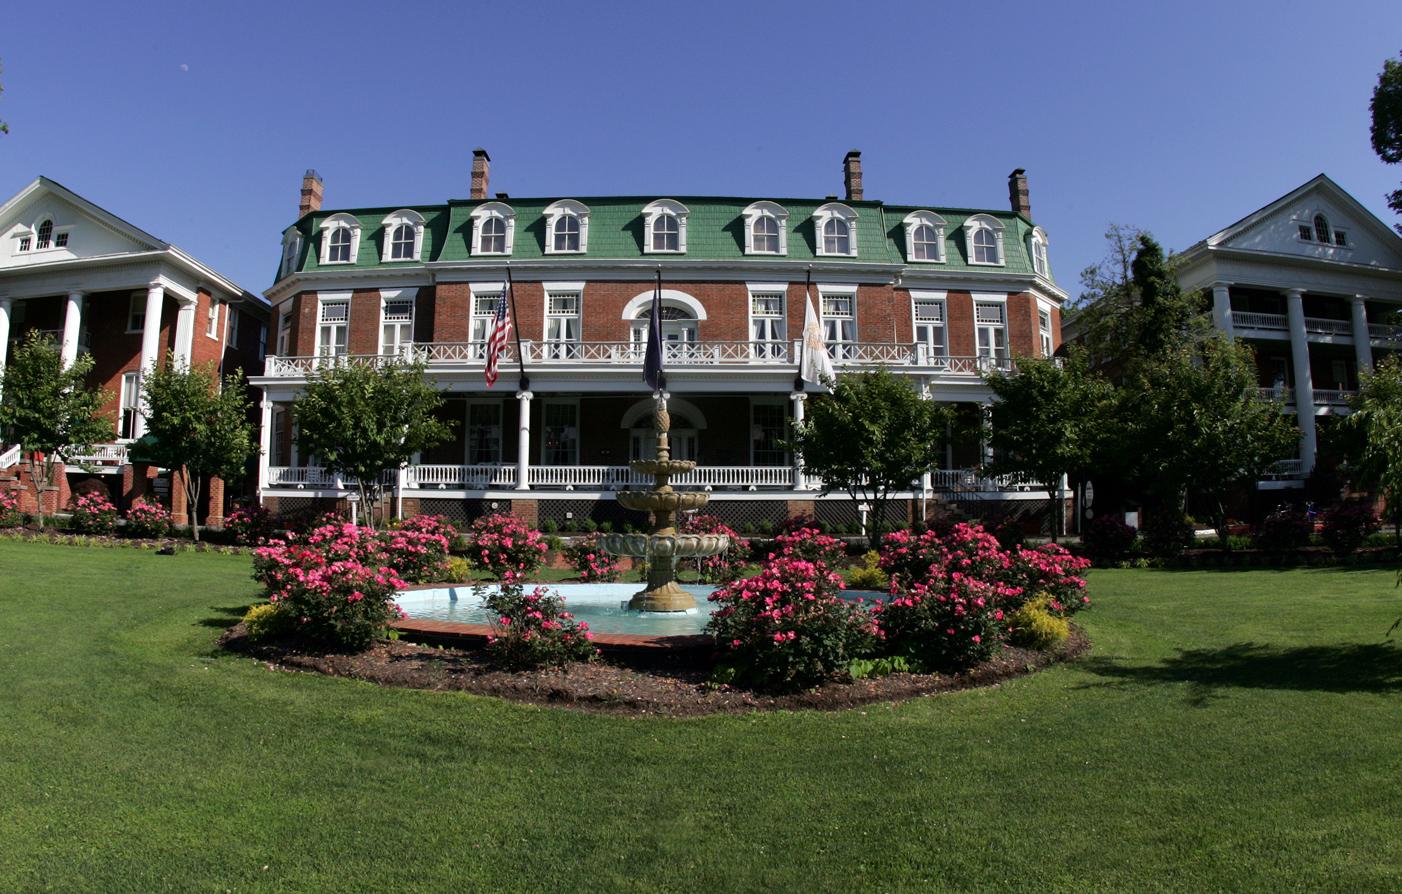 Abingdon (VA) United States  city photo : Hotels in Abingdon Virginia | Boutique Hotels in Abingdon | Abingdon ...